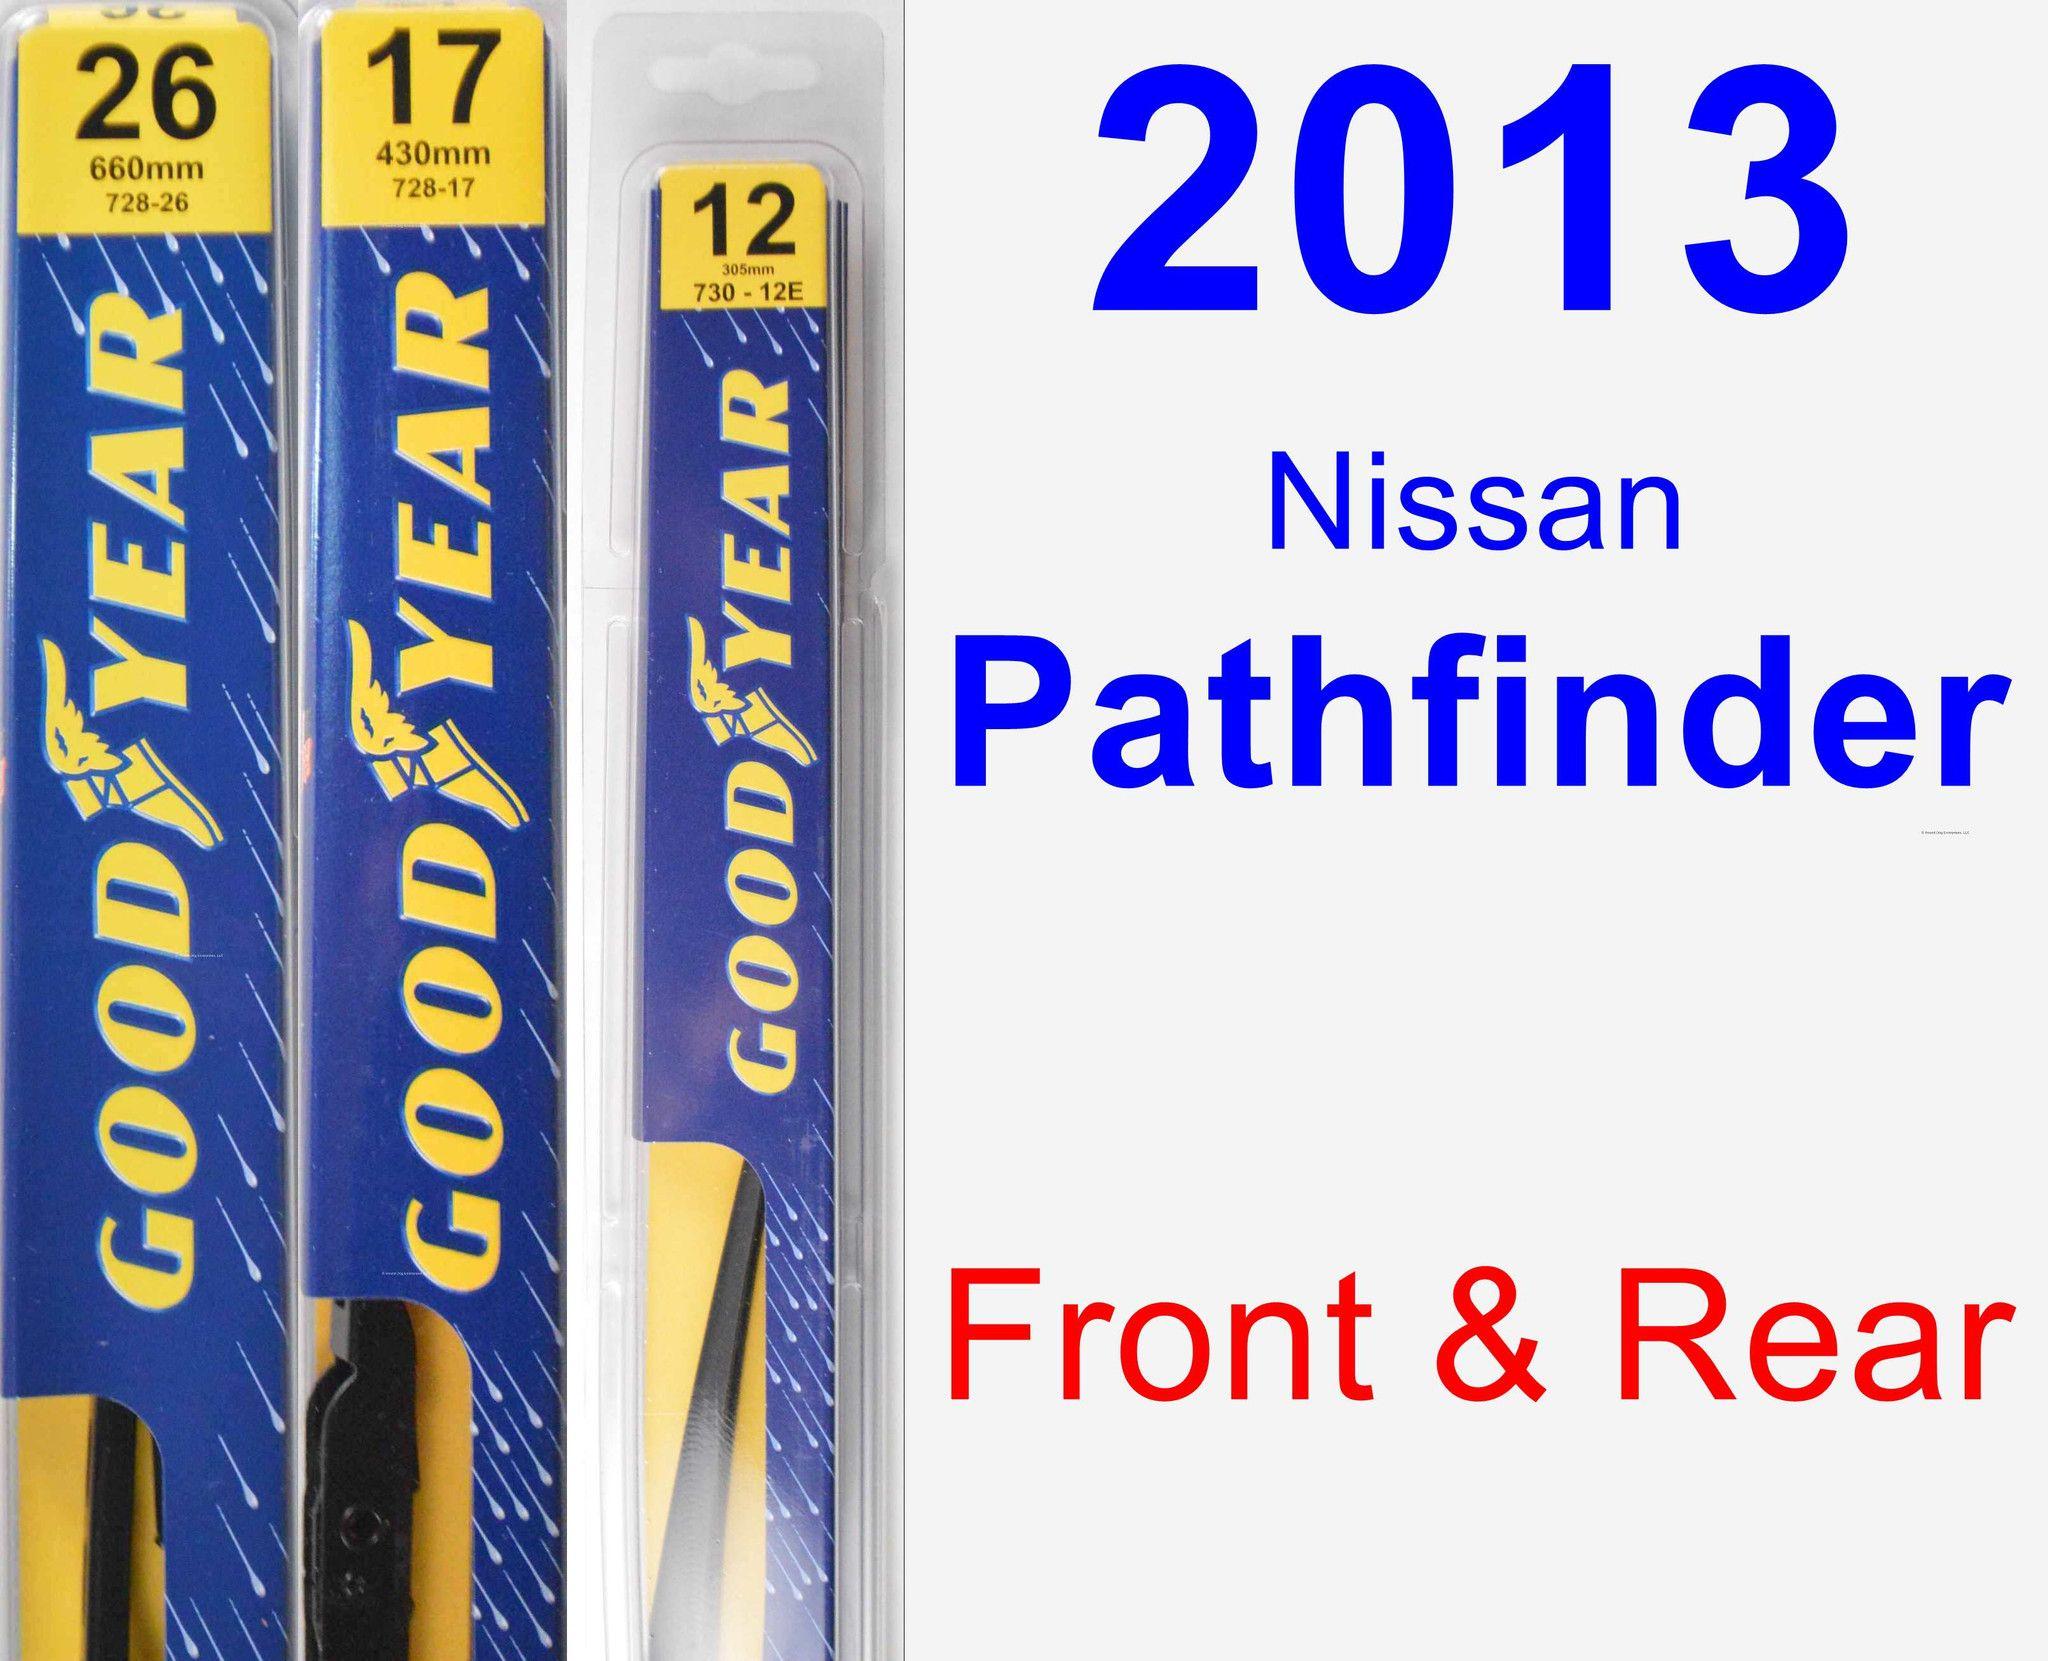 Front Rear Wiper Blade Pack For 2013 Nissan Pathfinder Premium